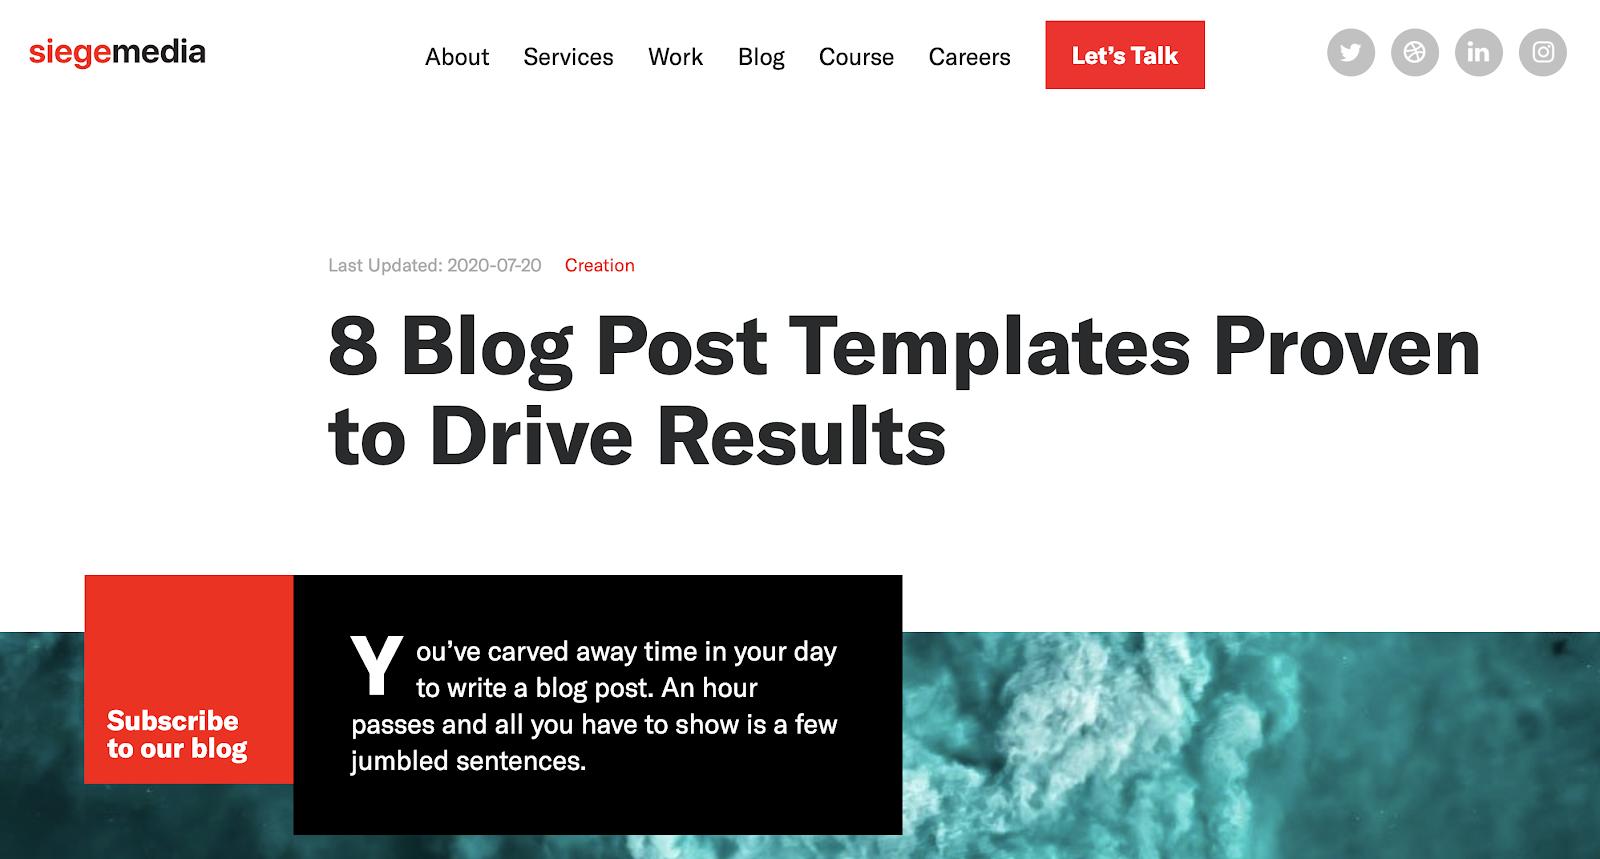 SiegeMedia blog